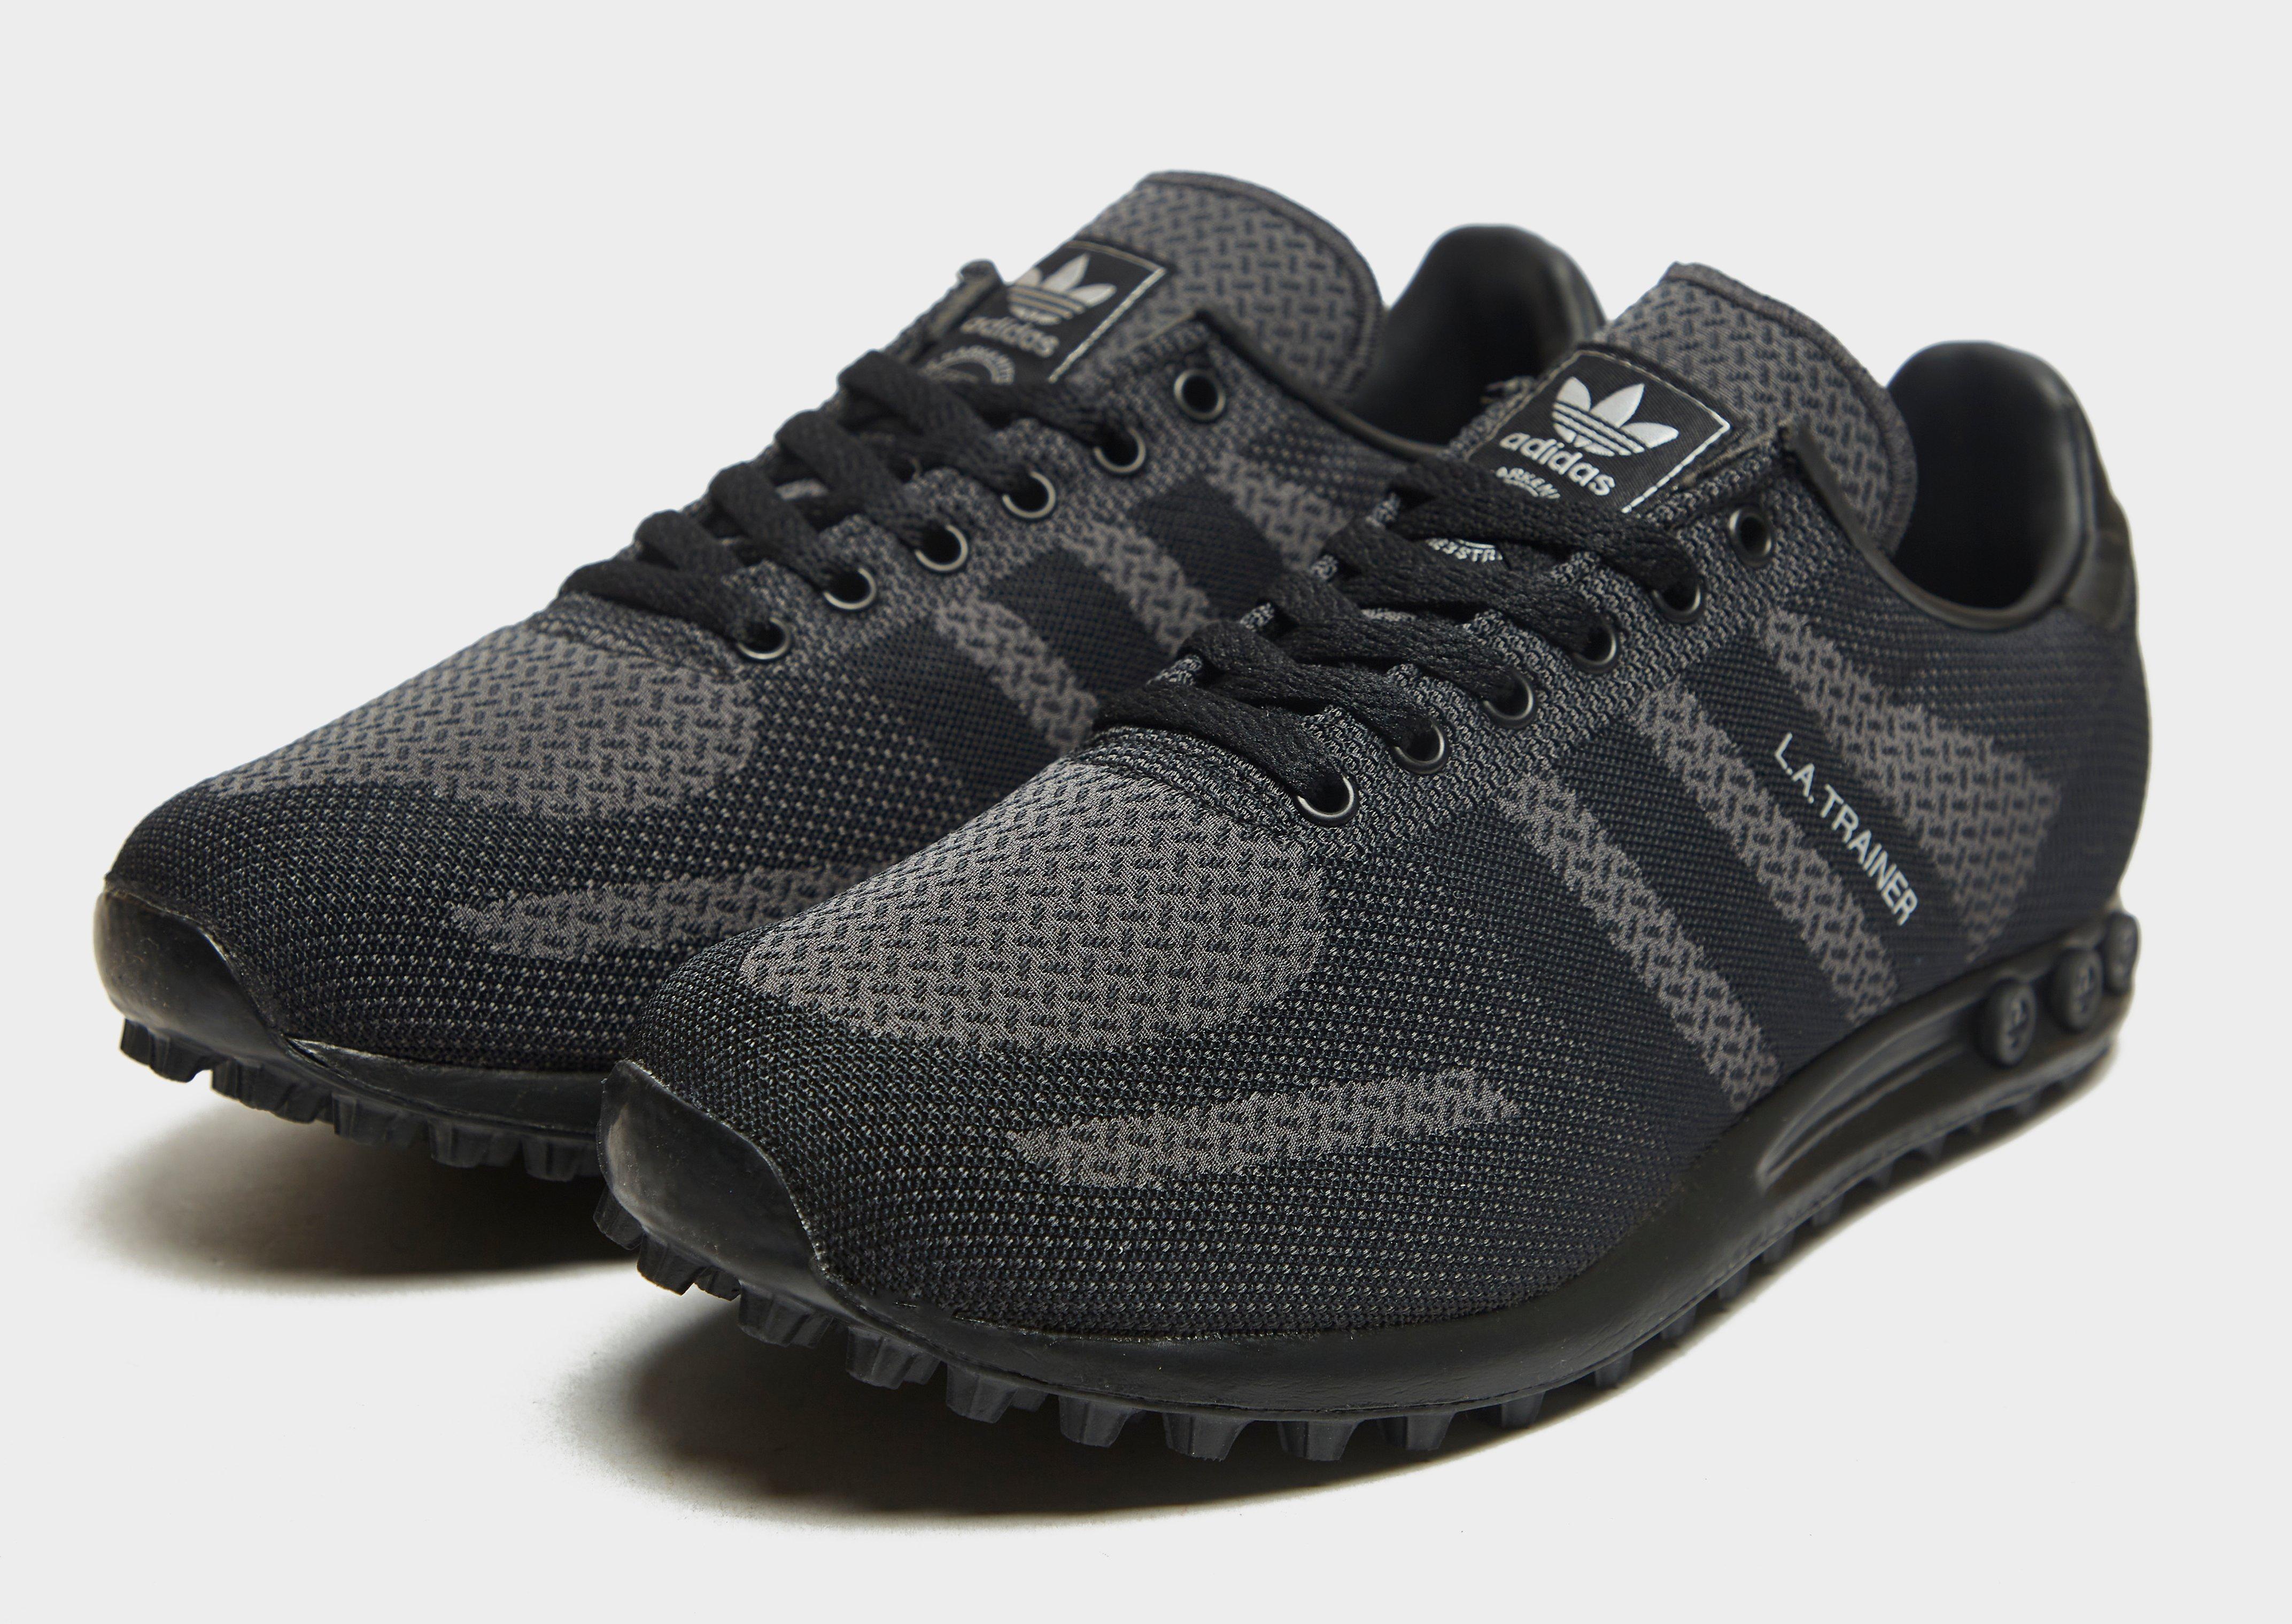 la trainer adidas nere